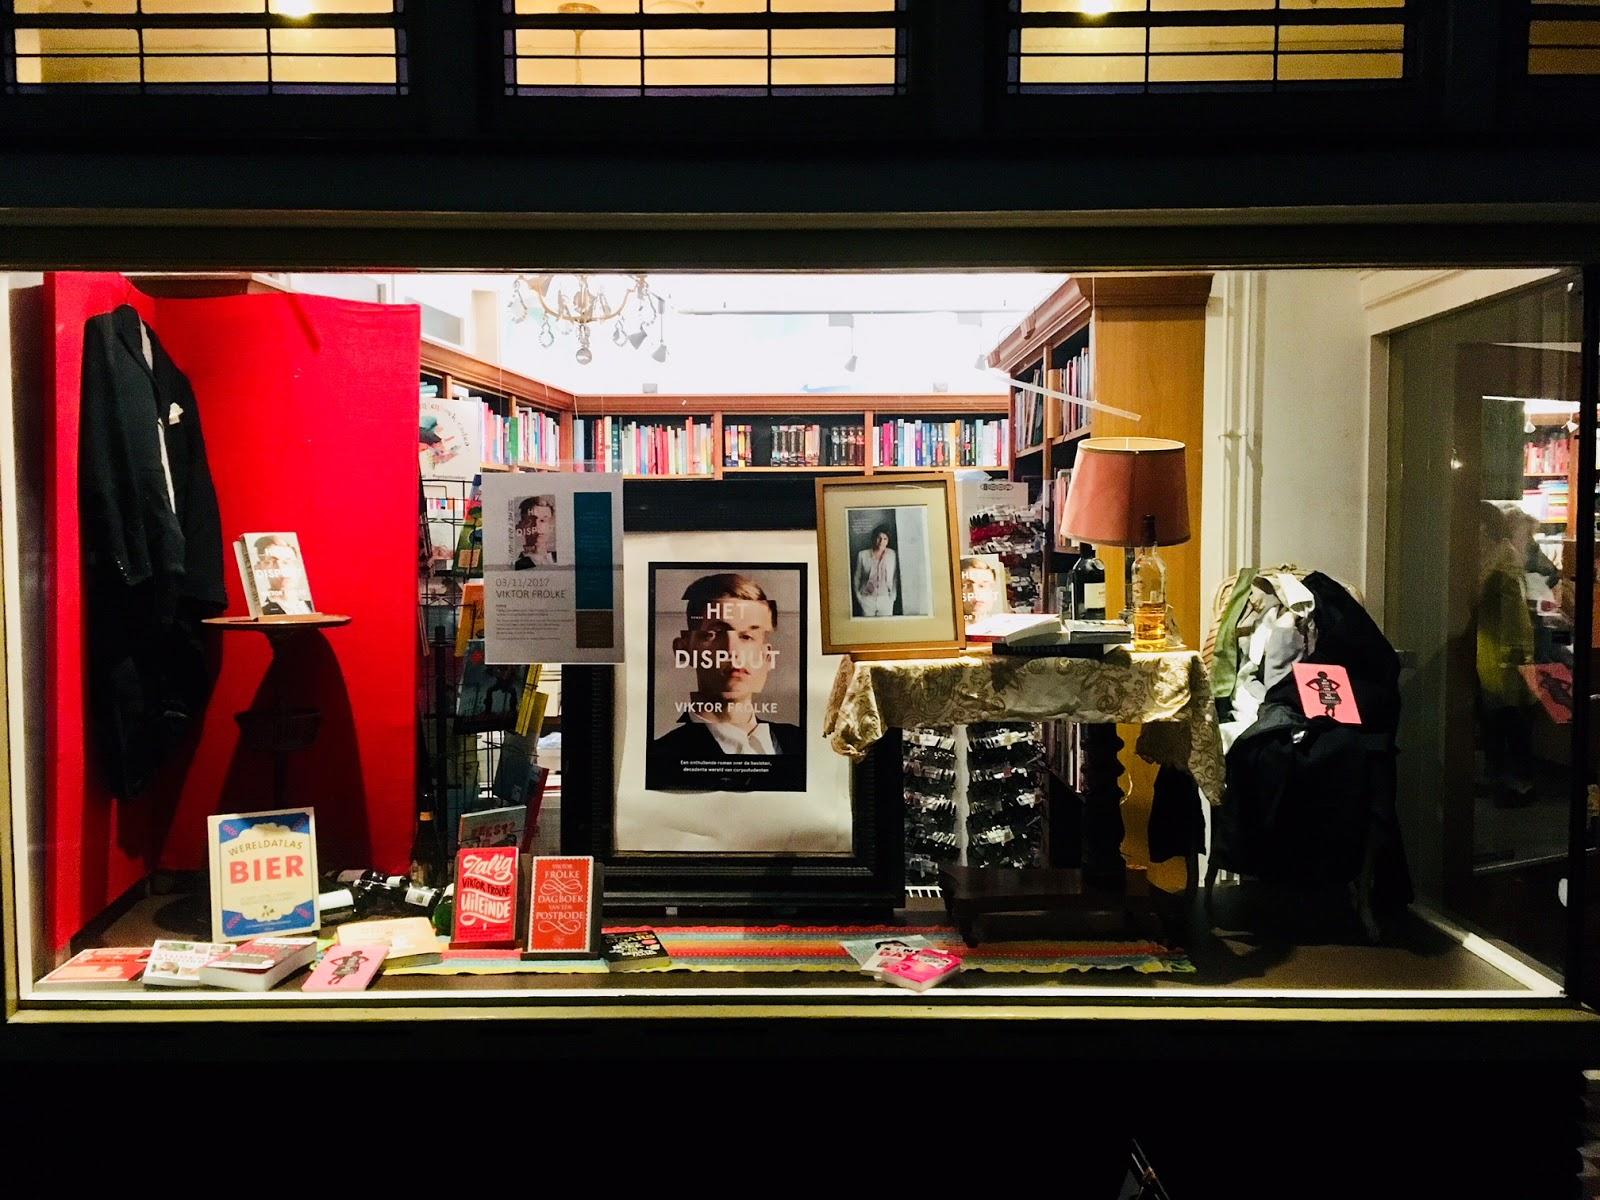 7 Jaloersmakende Boekenkasten : Viktor frölke